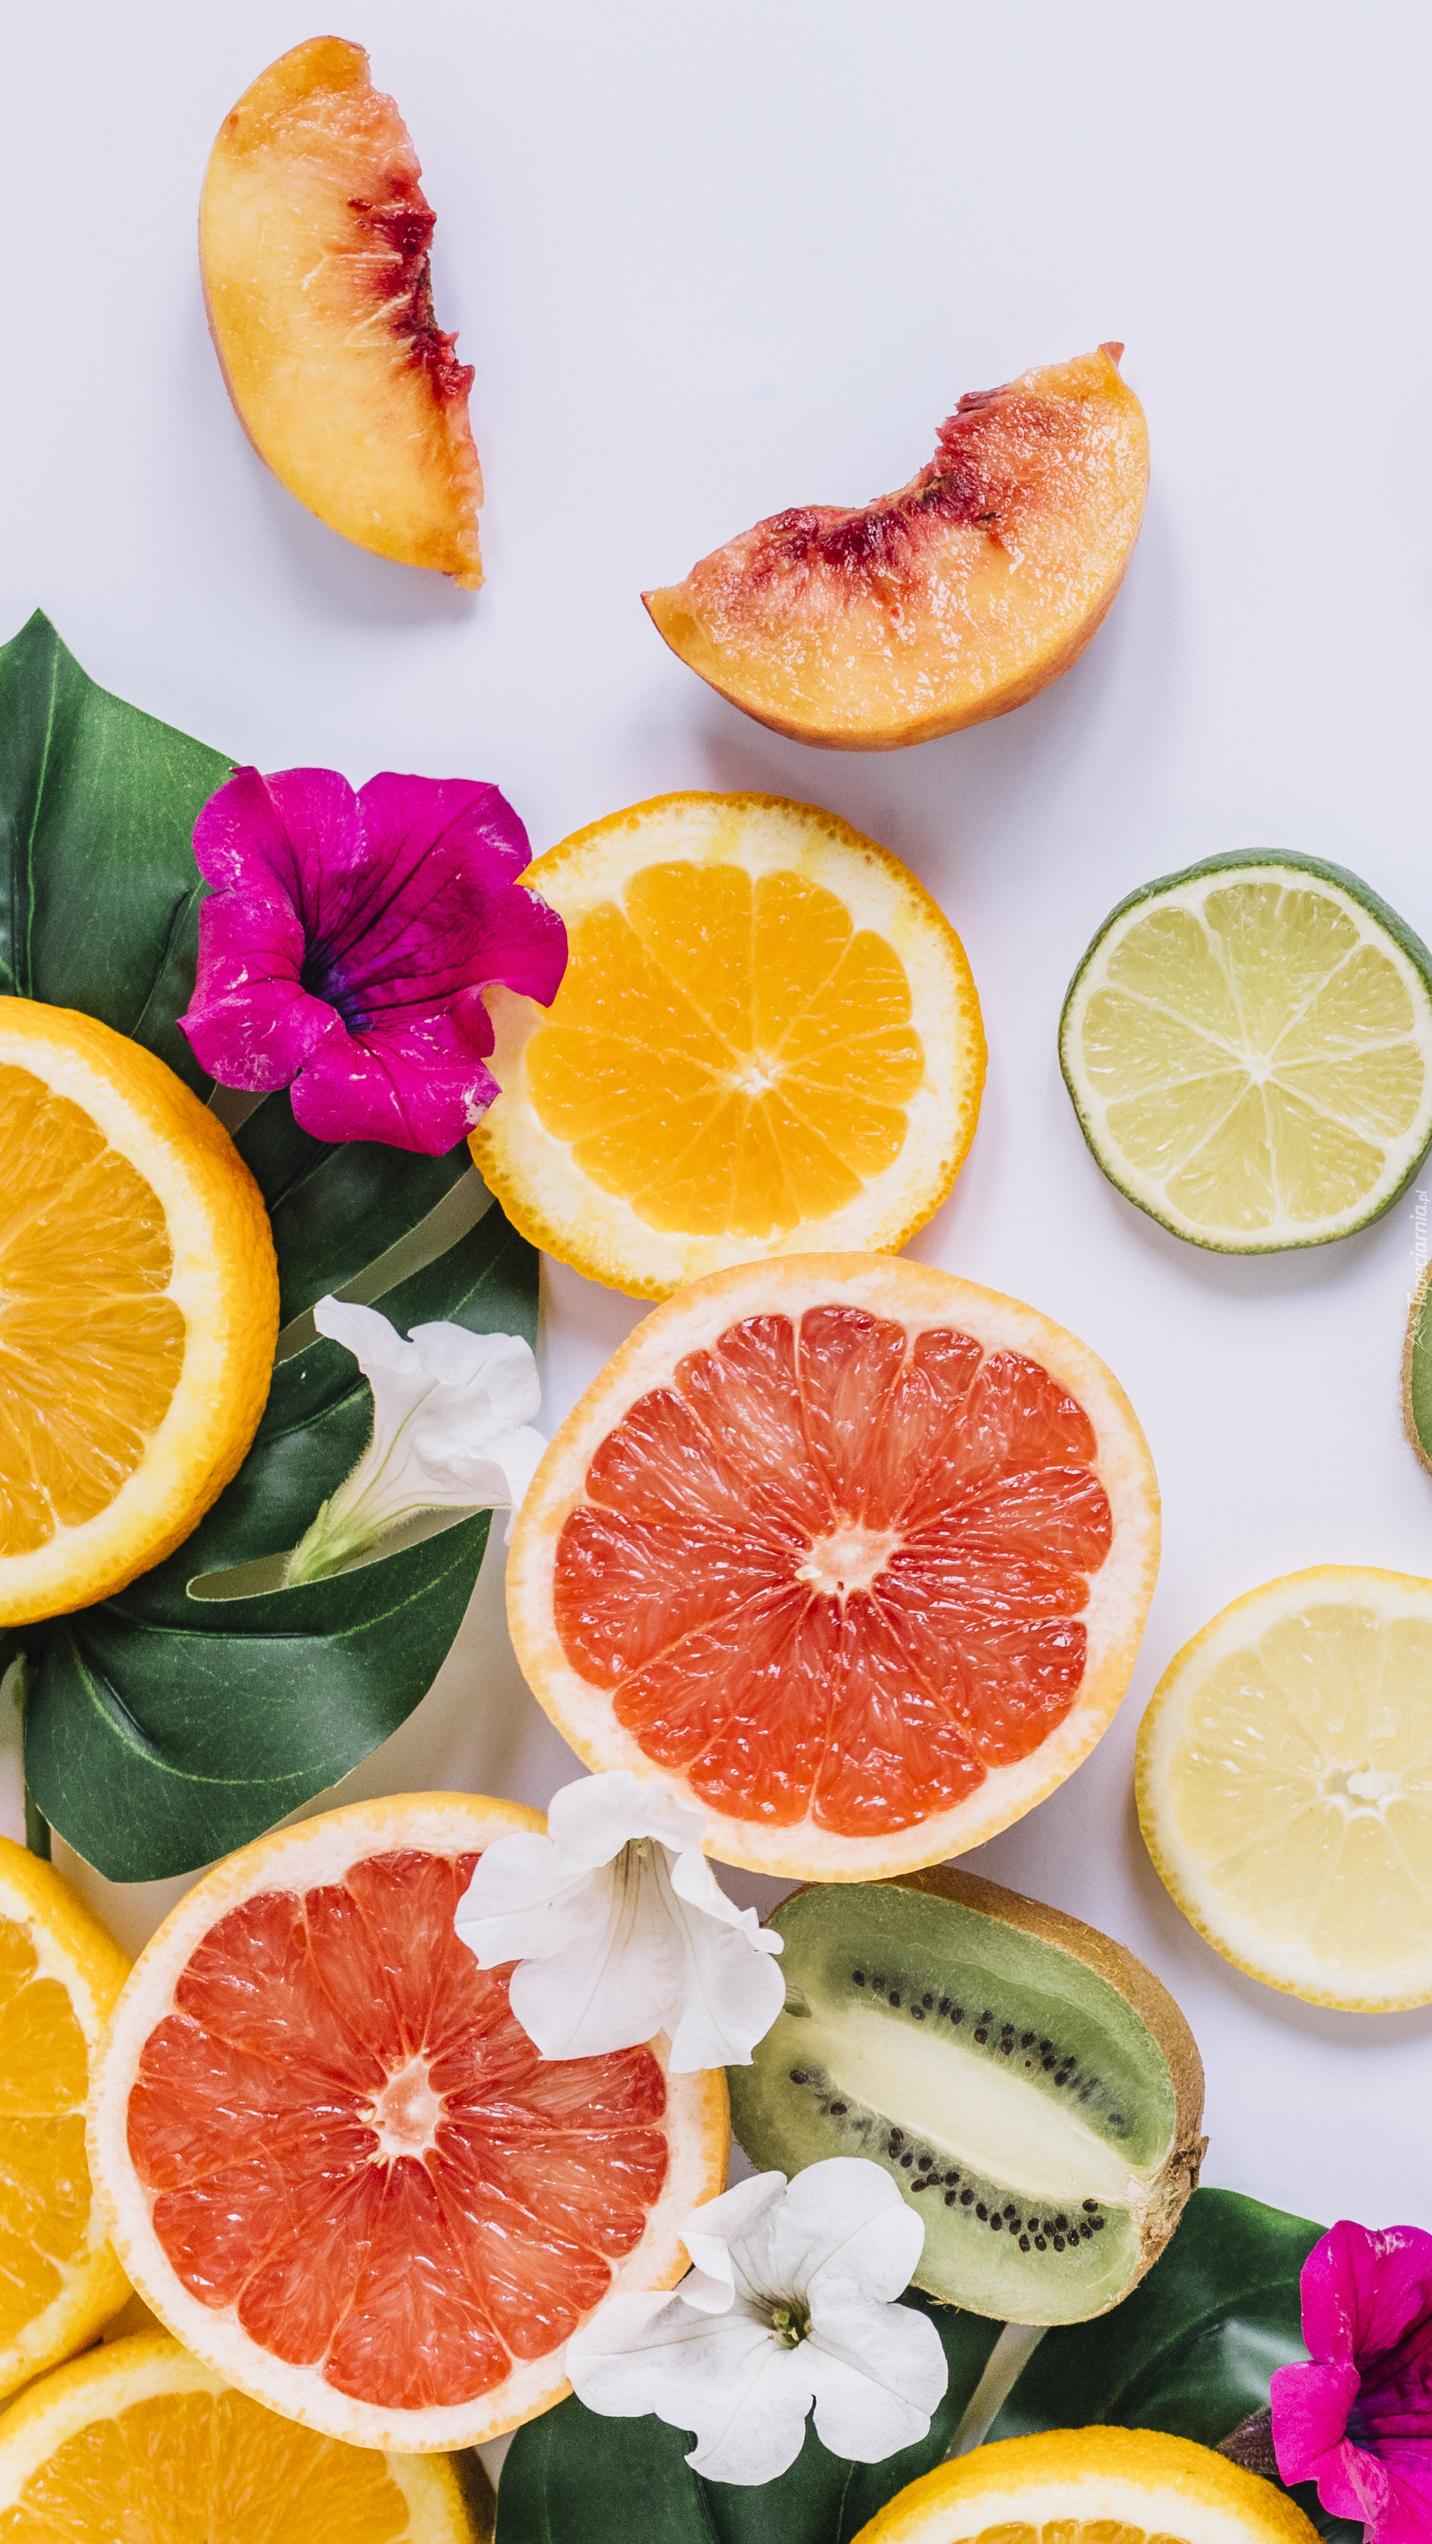 Pokrojone owoce